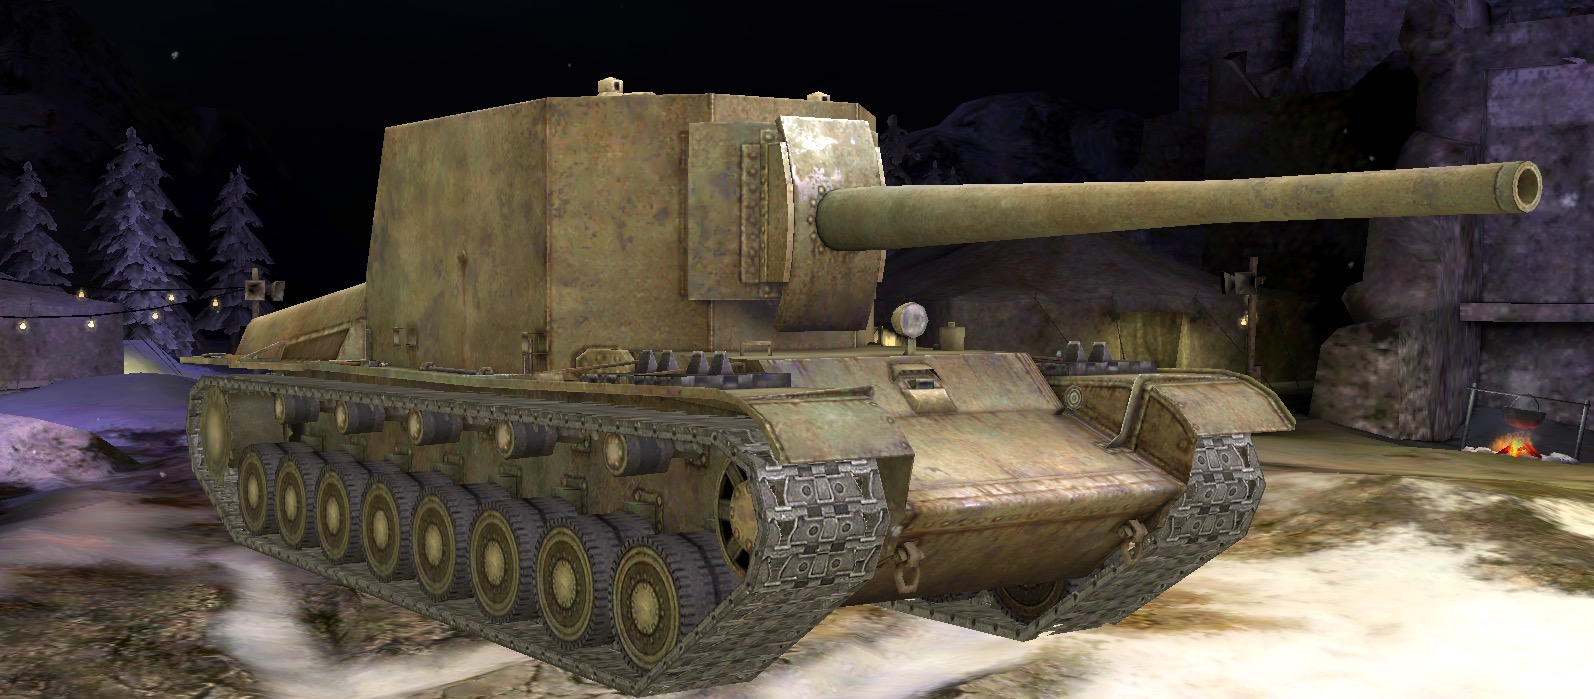 SU-100Y - World of Tanks Blitz Wiki*